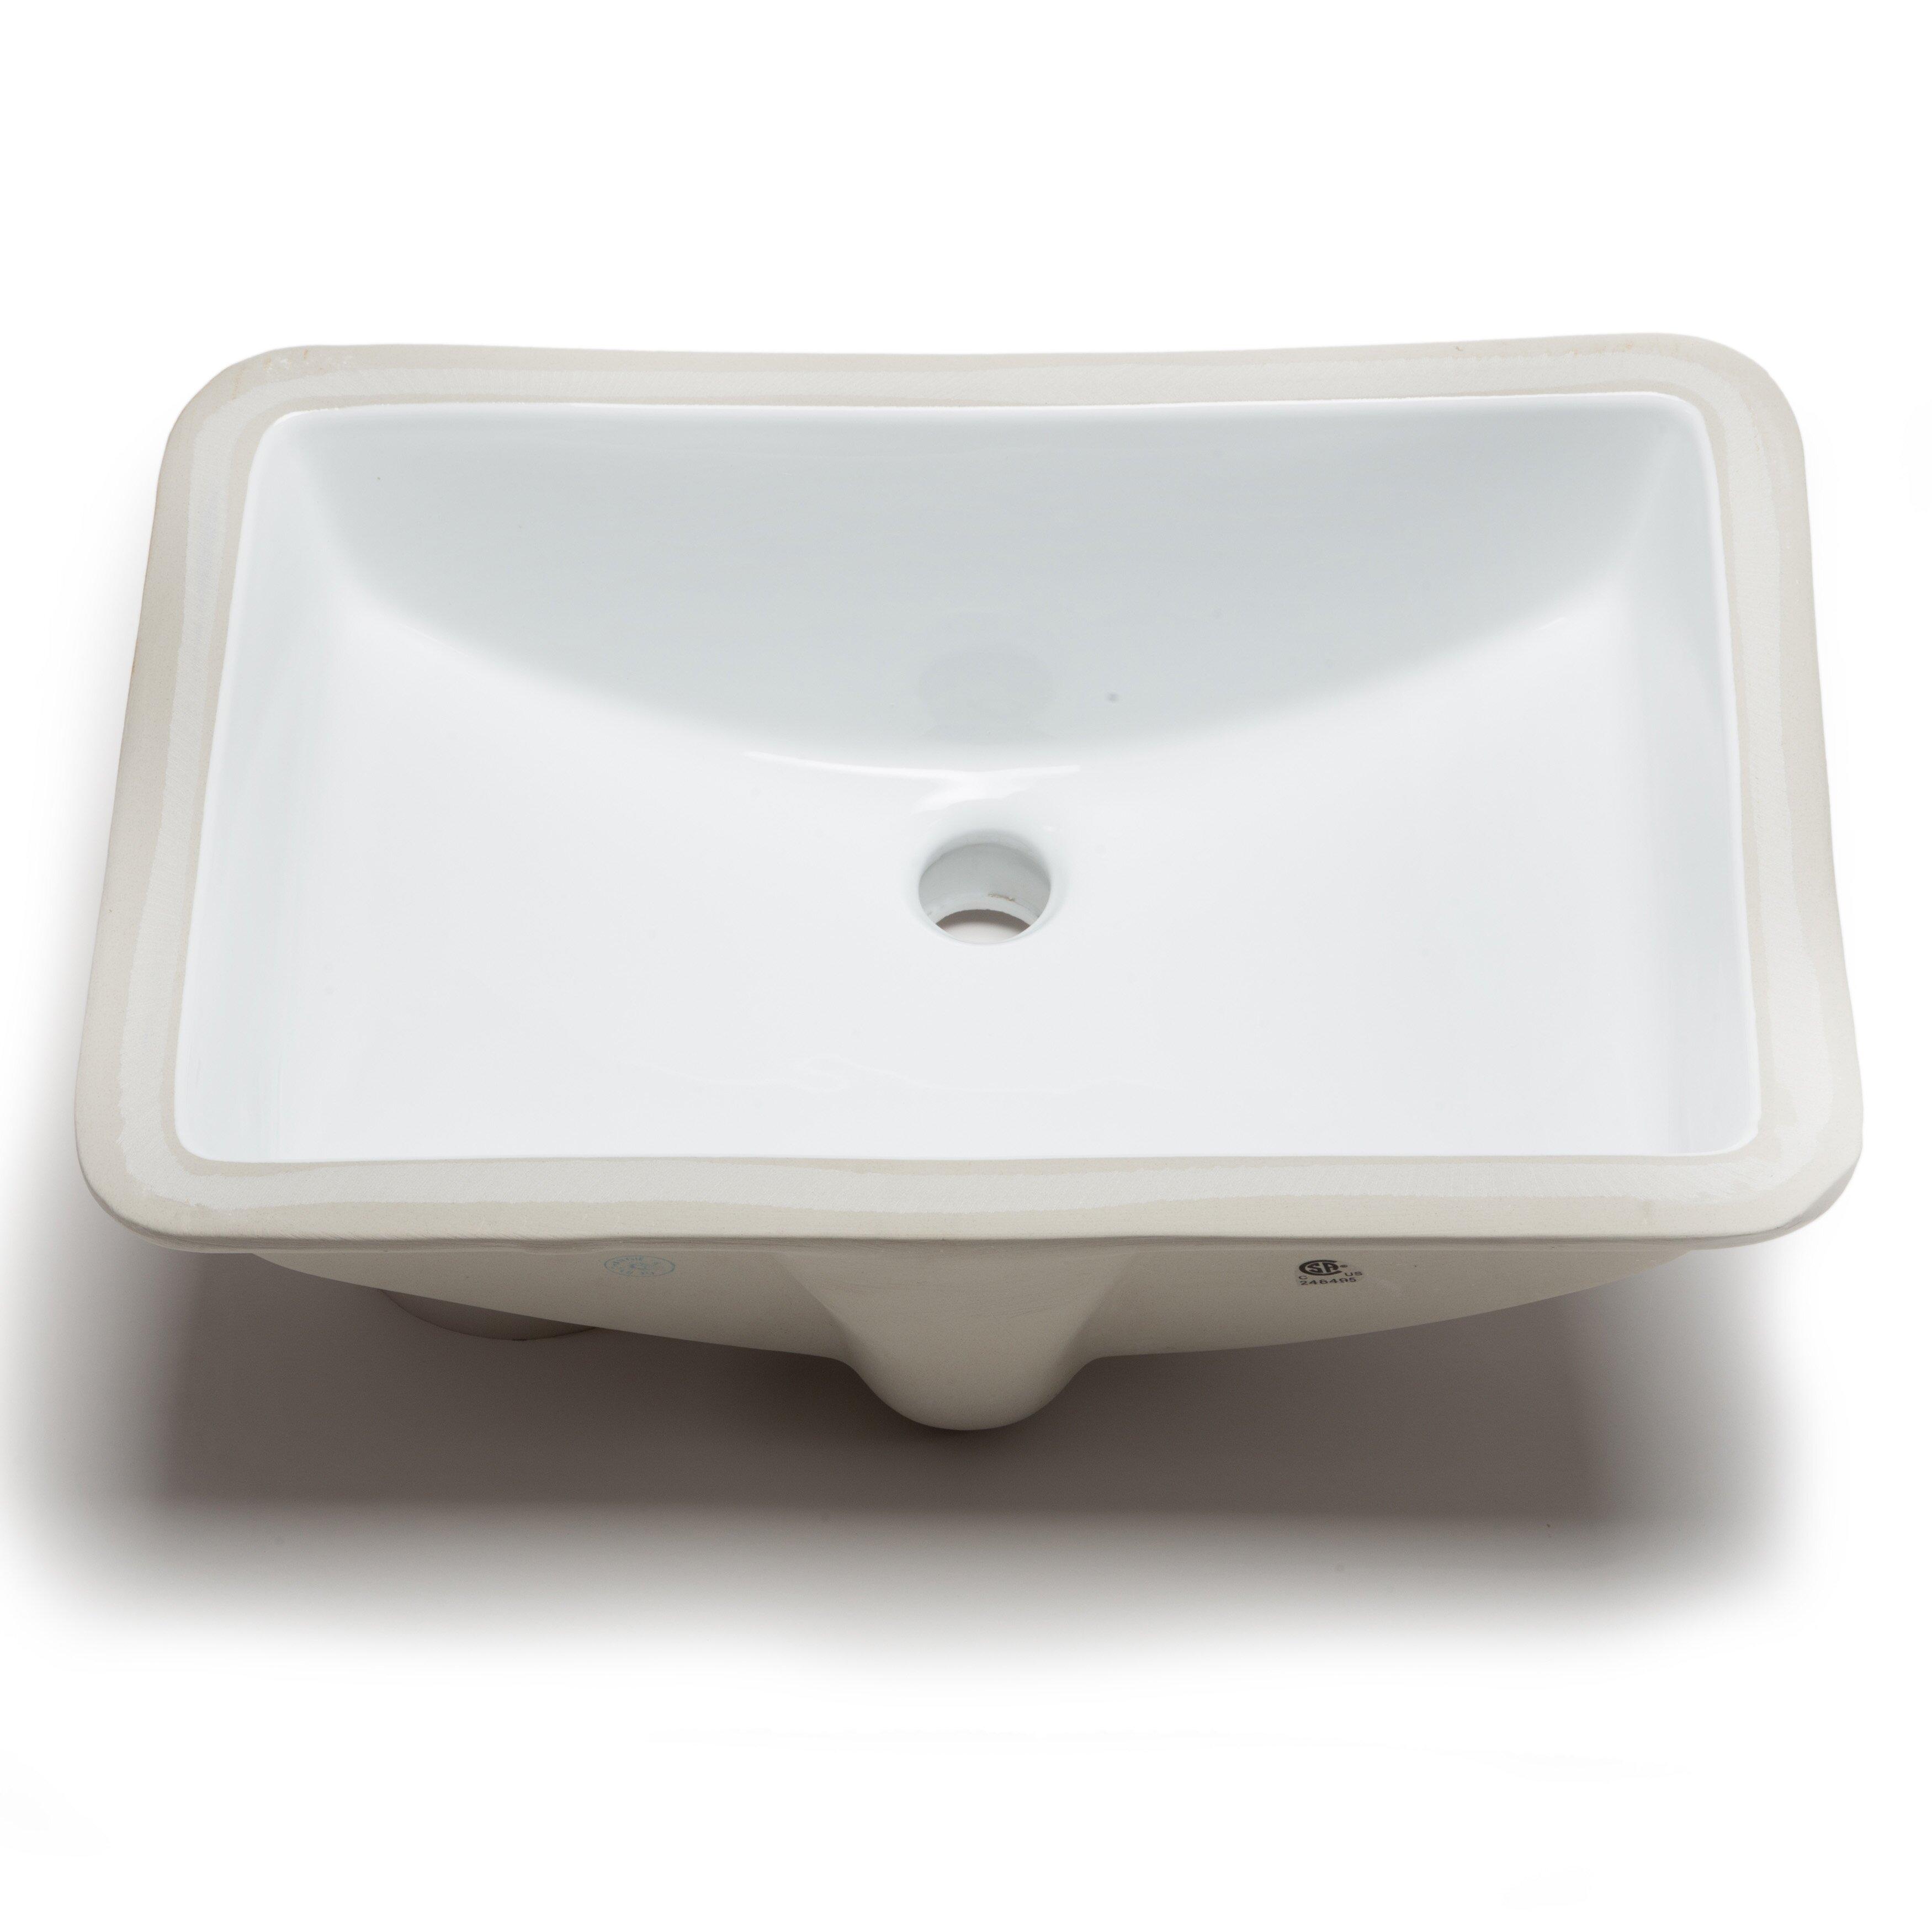 Bathroom Sink Bowls : Home Improvement Bathroom Fixtures ... Hahn Part #: VC007 / VC008 SKU ...